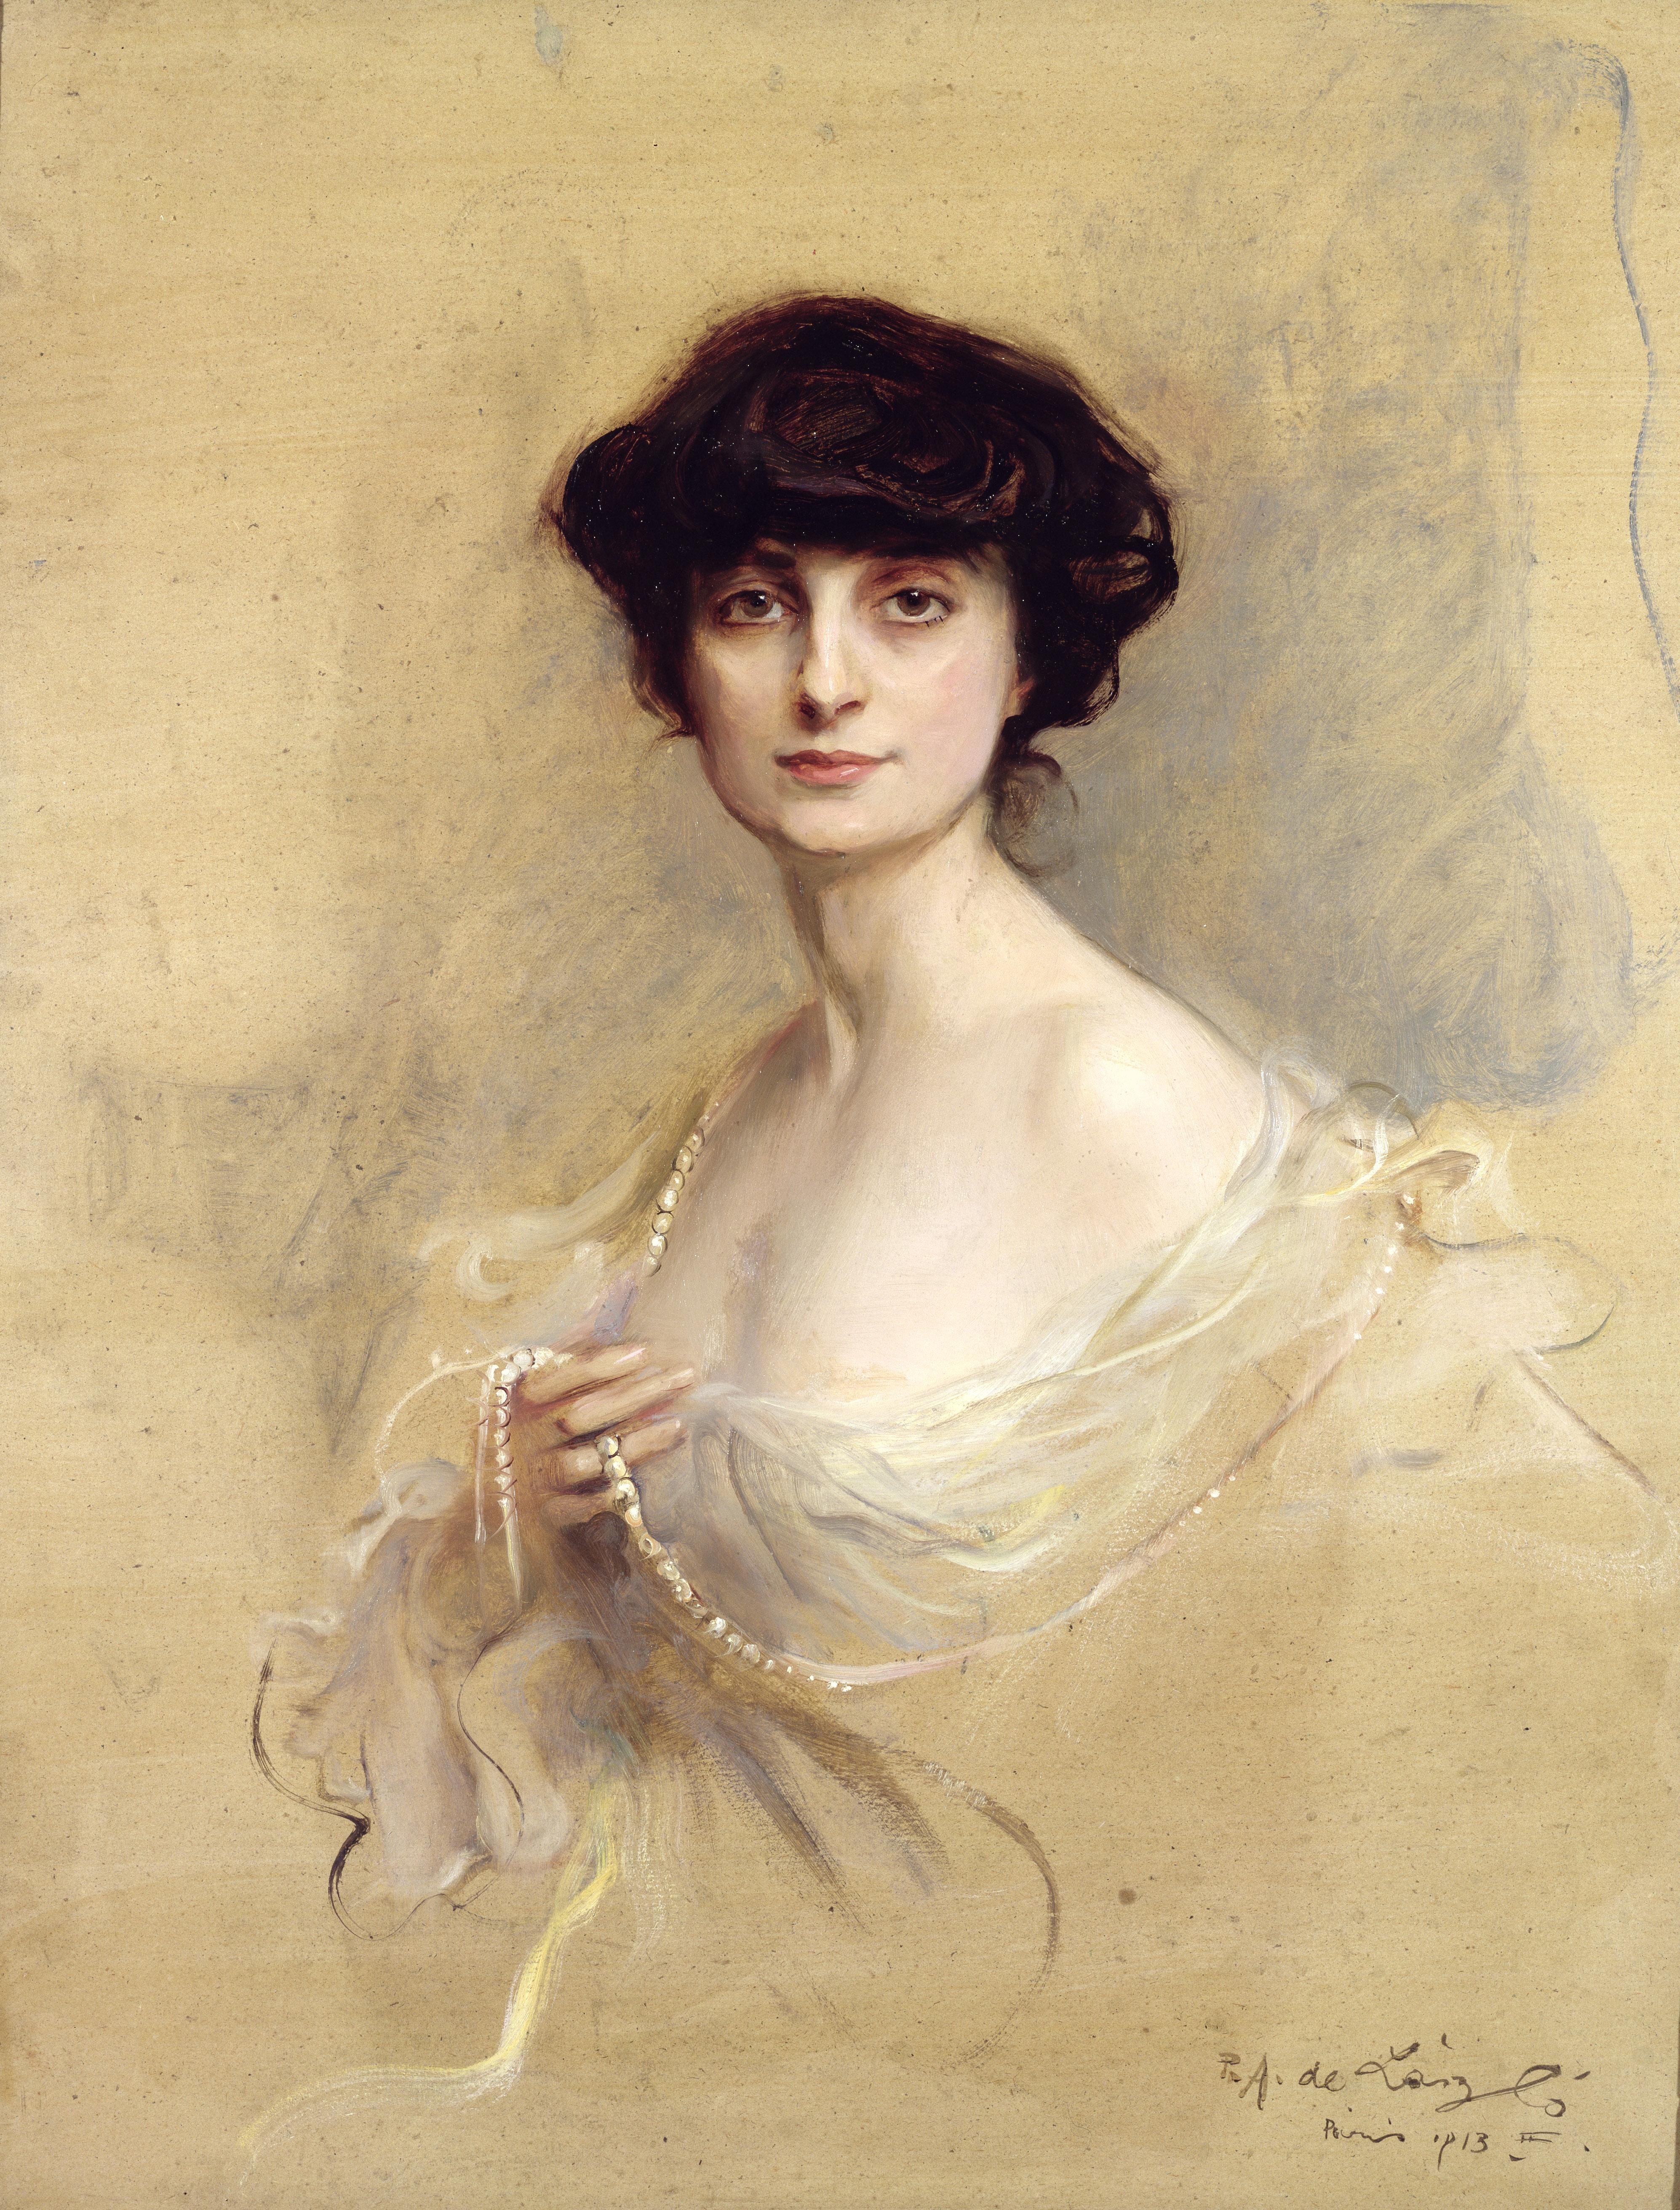 http://upload.wikimedia.org/wikipedia/commons/3/3e/Laszlo_-_Anna_de_Noailles.jpg